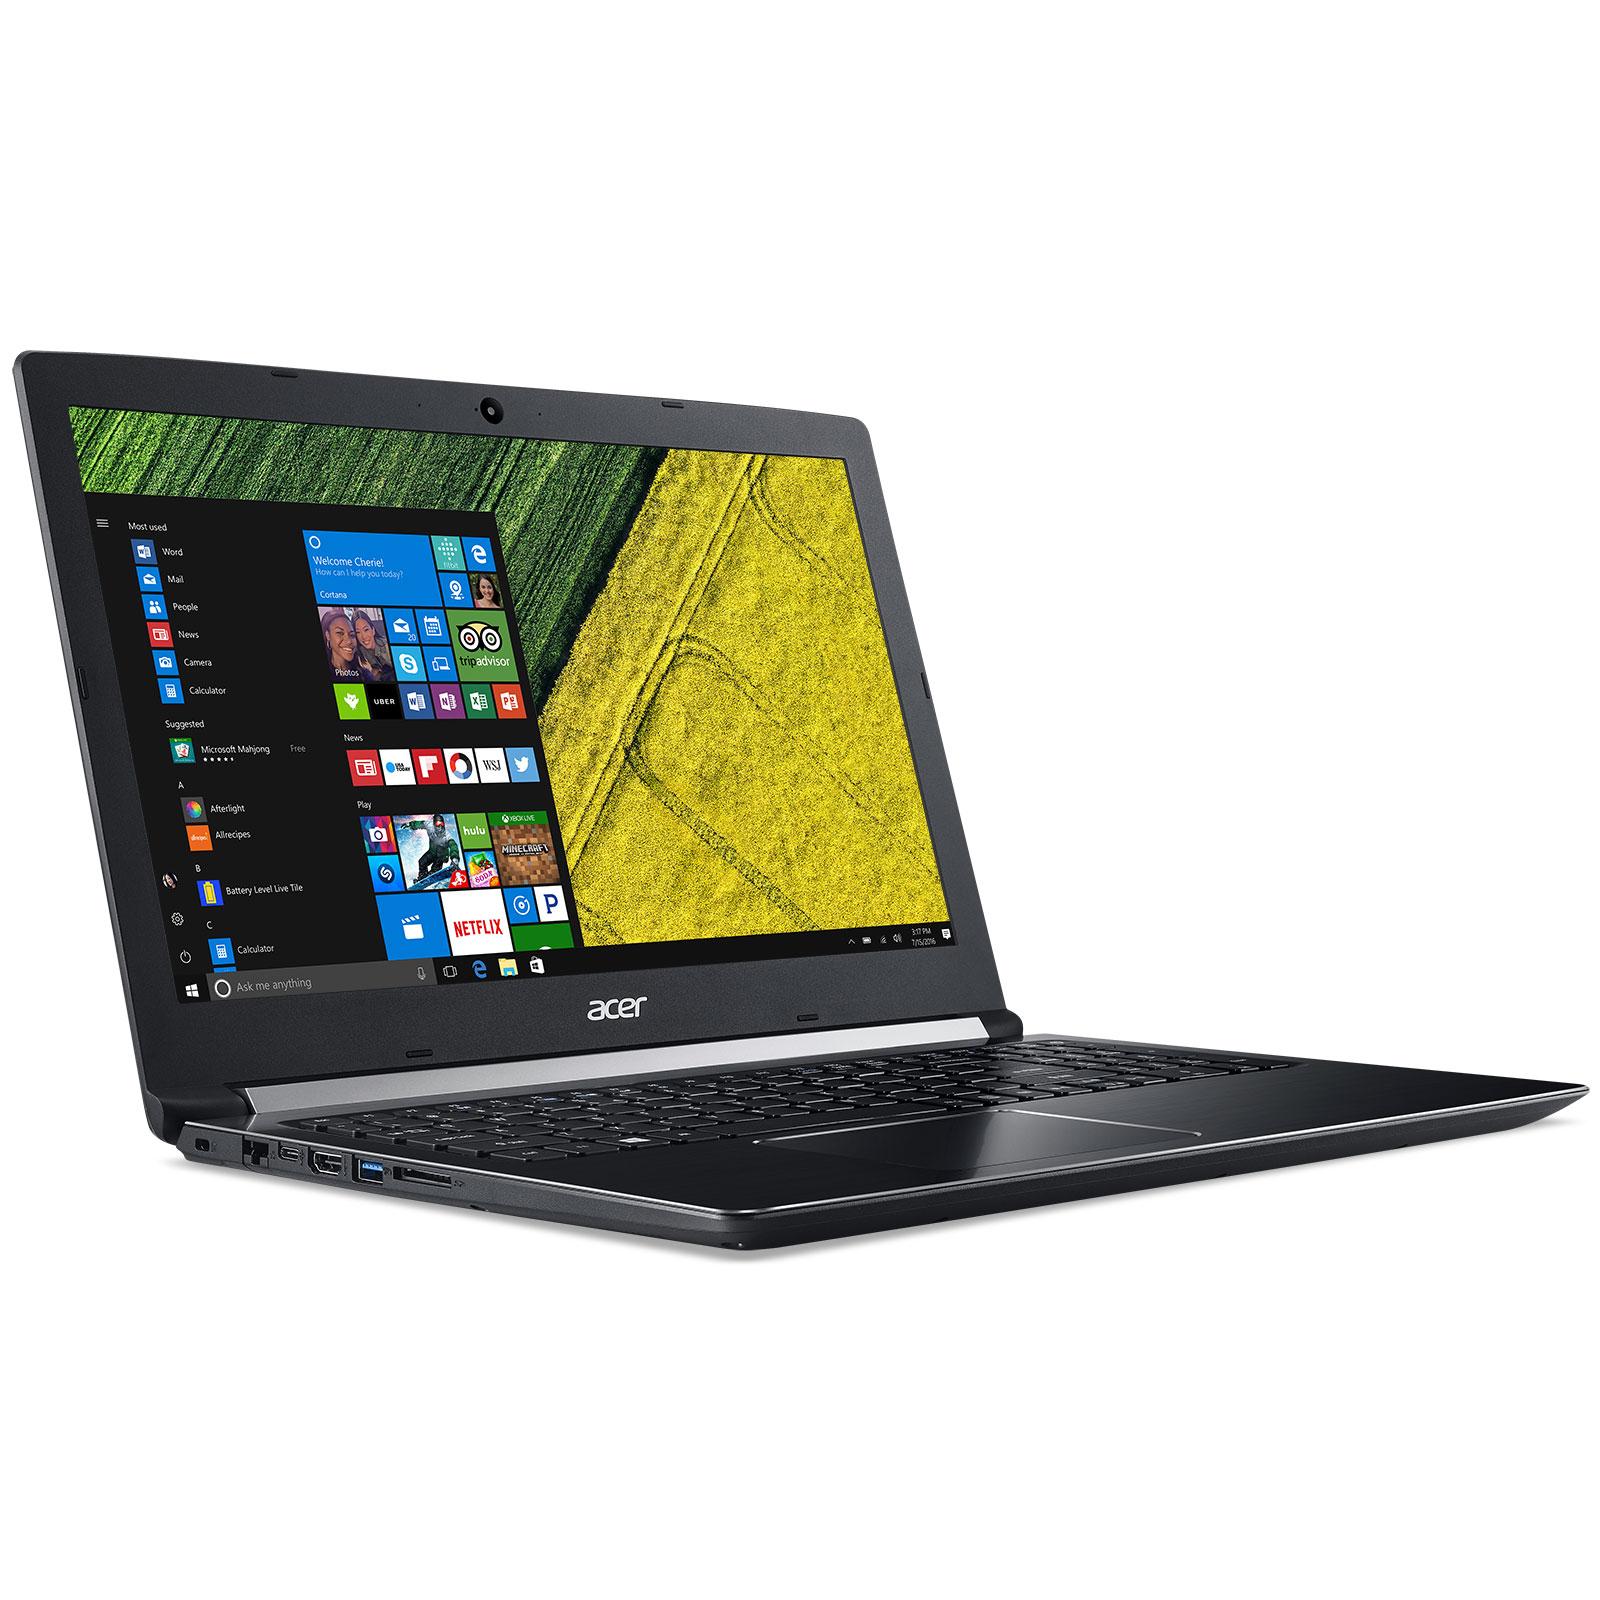 "Pc portable 15,6"" ACER Aspire 5 A515-51-34LE - Full HD IPS, i3-6006U, RAM 4 Go, SSD 256 Go, Windows 10"